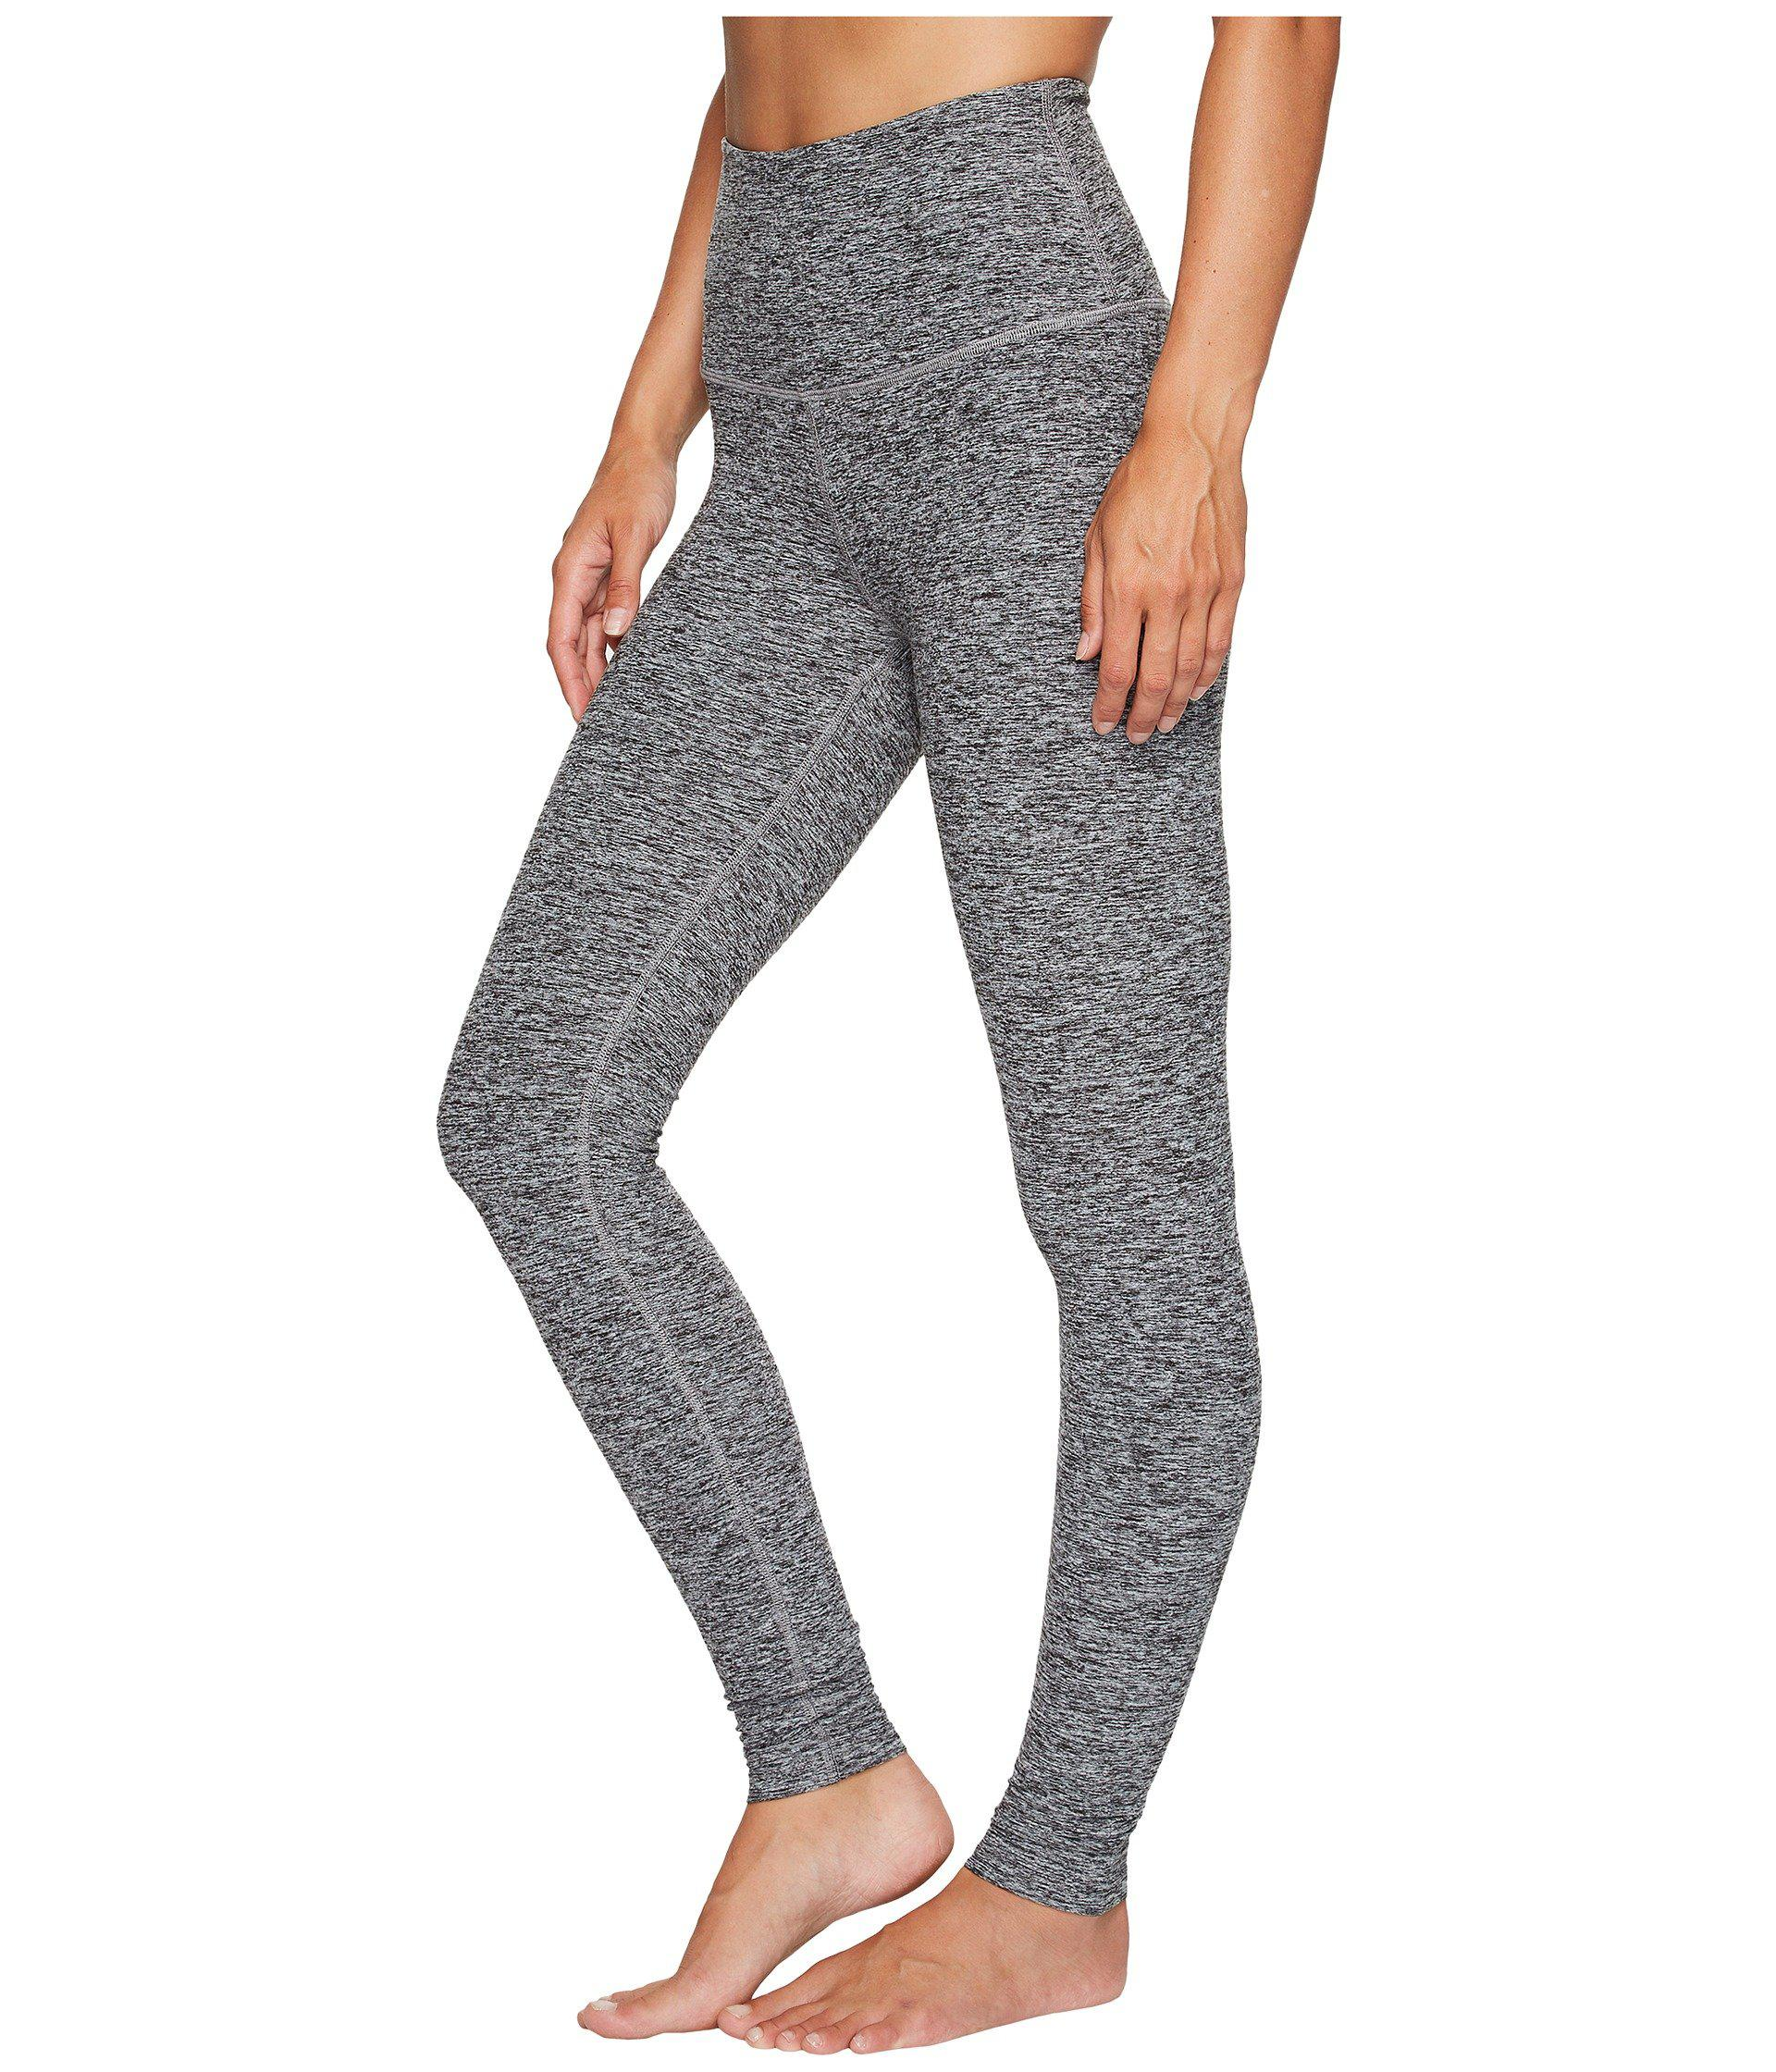 79b530851f736 Lyst - Beyond Yoga High Waist Long Legging (black/white) Women's Workout in  Black